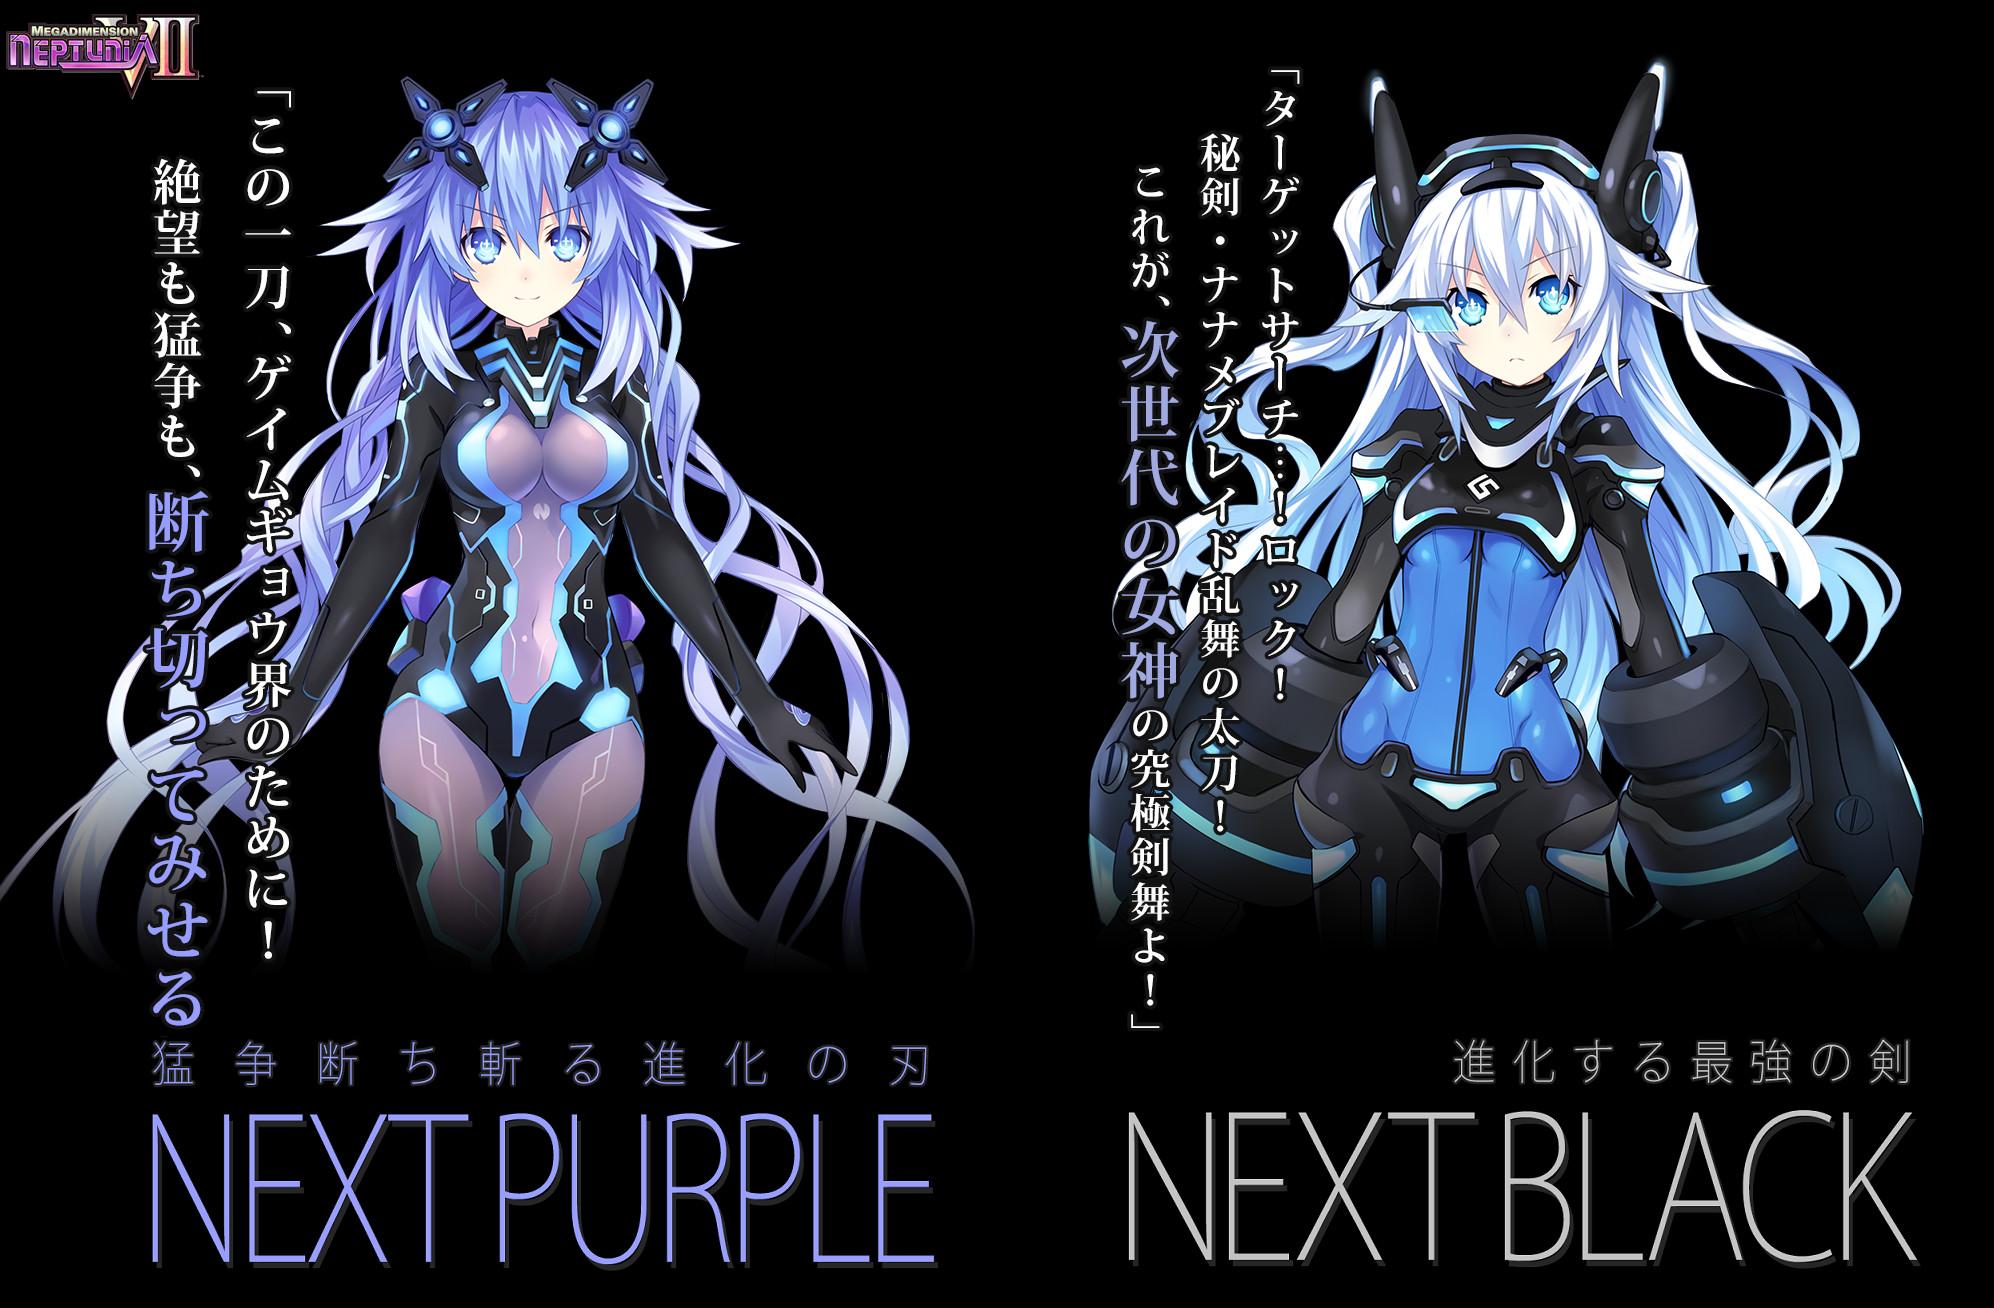 Megadimension Neptunia V2: Next Purple-Next Black by Freshman91 on ...